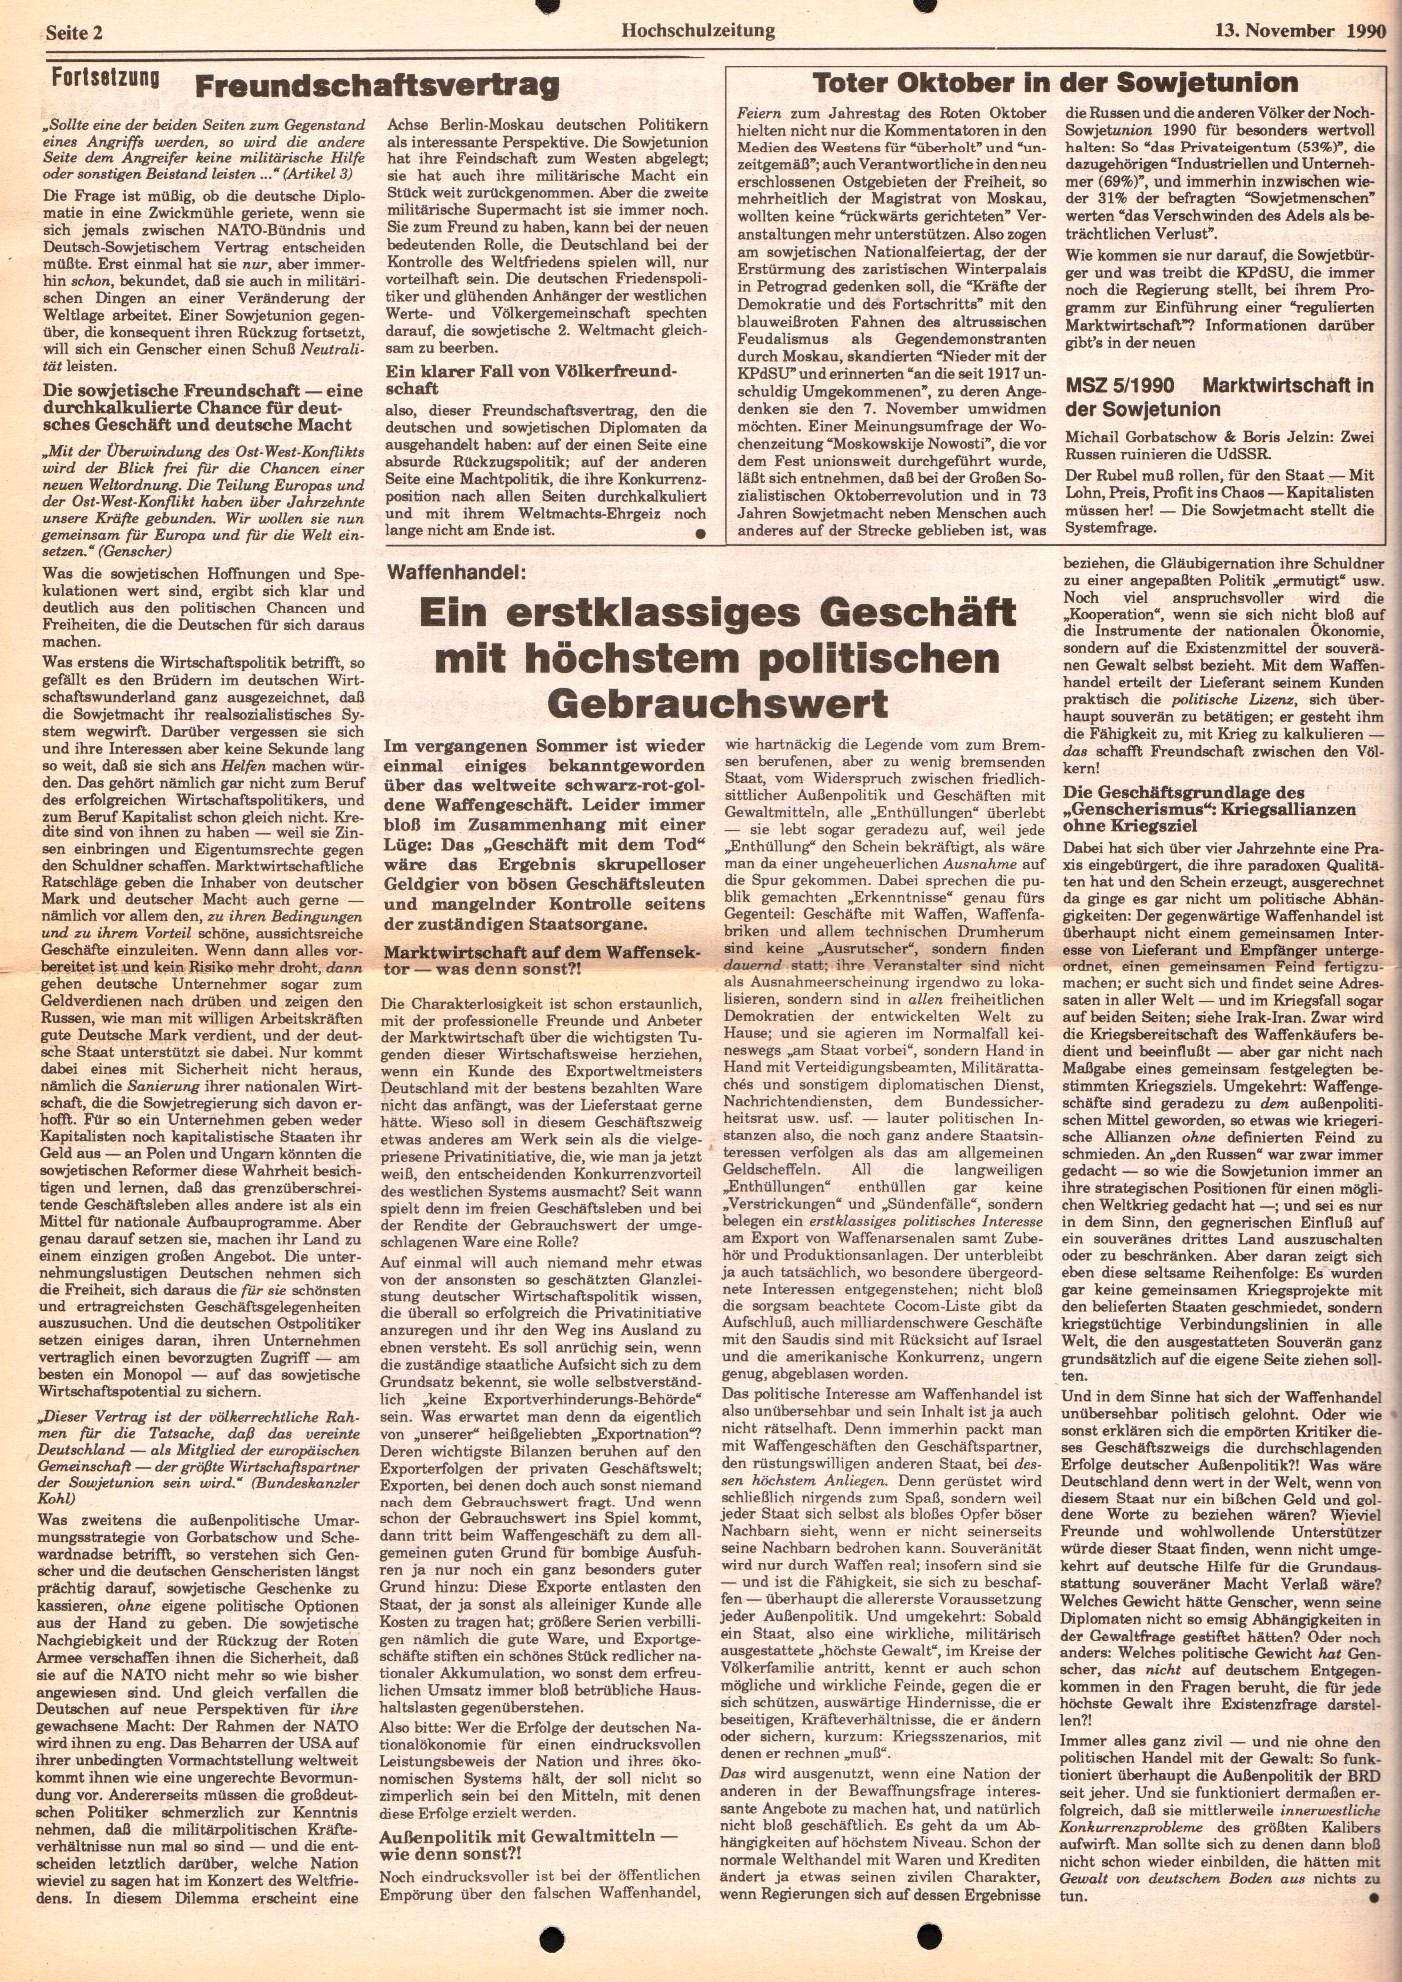 Stuttgart_MG_Hochschulzeitung_1990_12_02